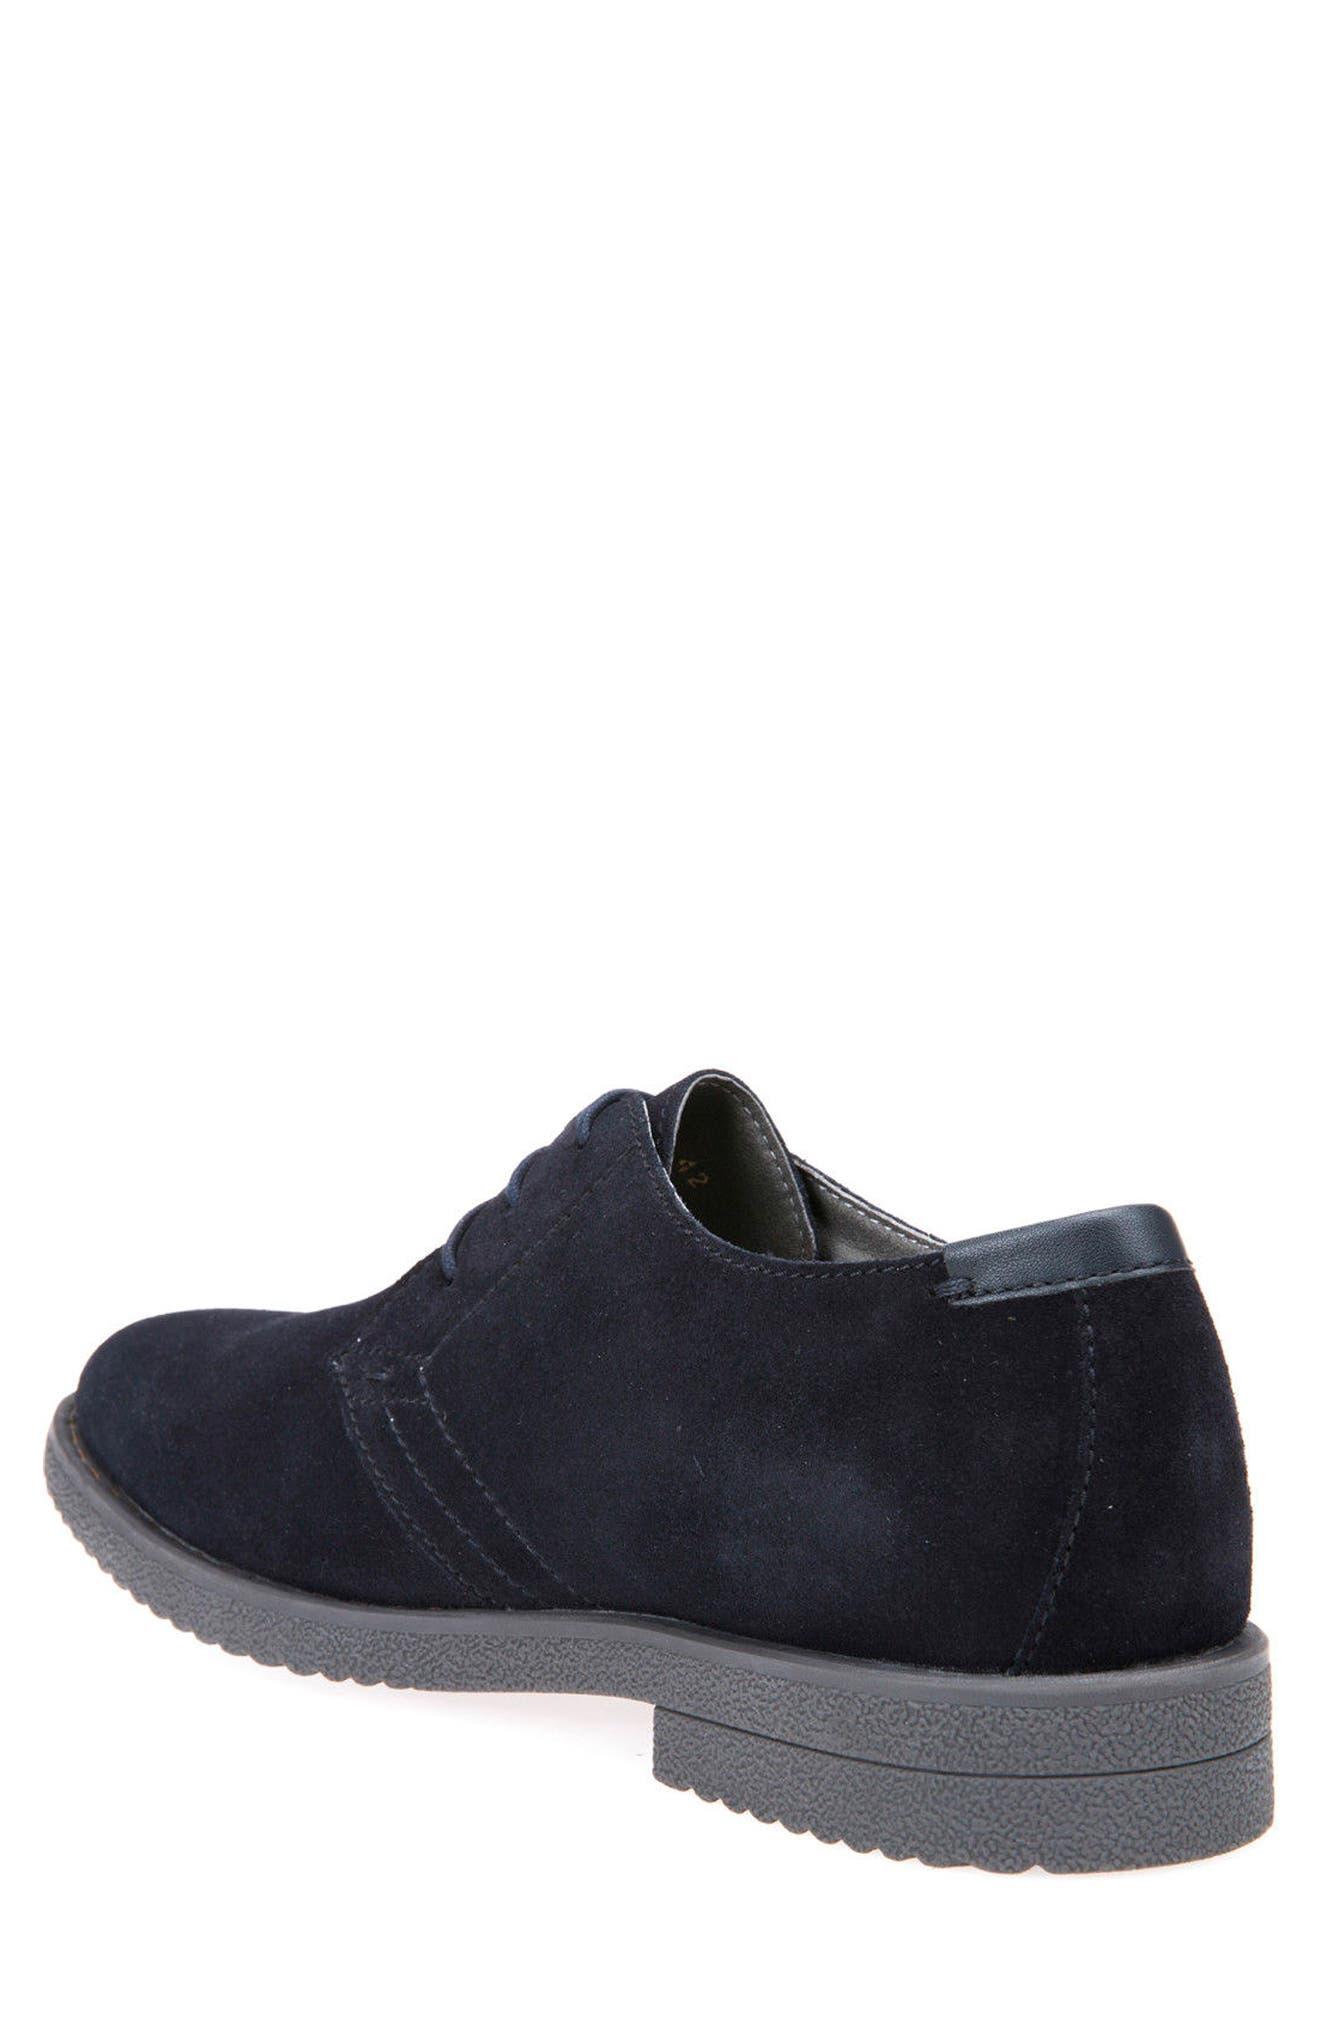 Brandled Buck Shoe,                             Alternate thumbnail 2, color,